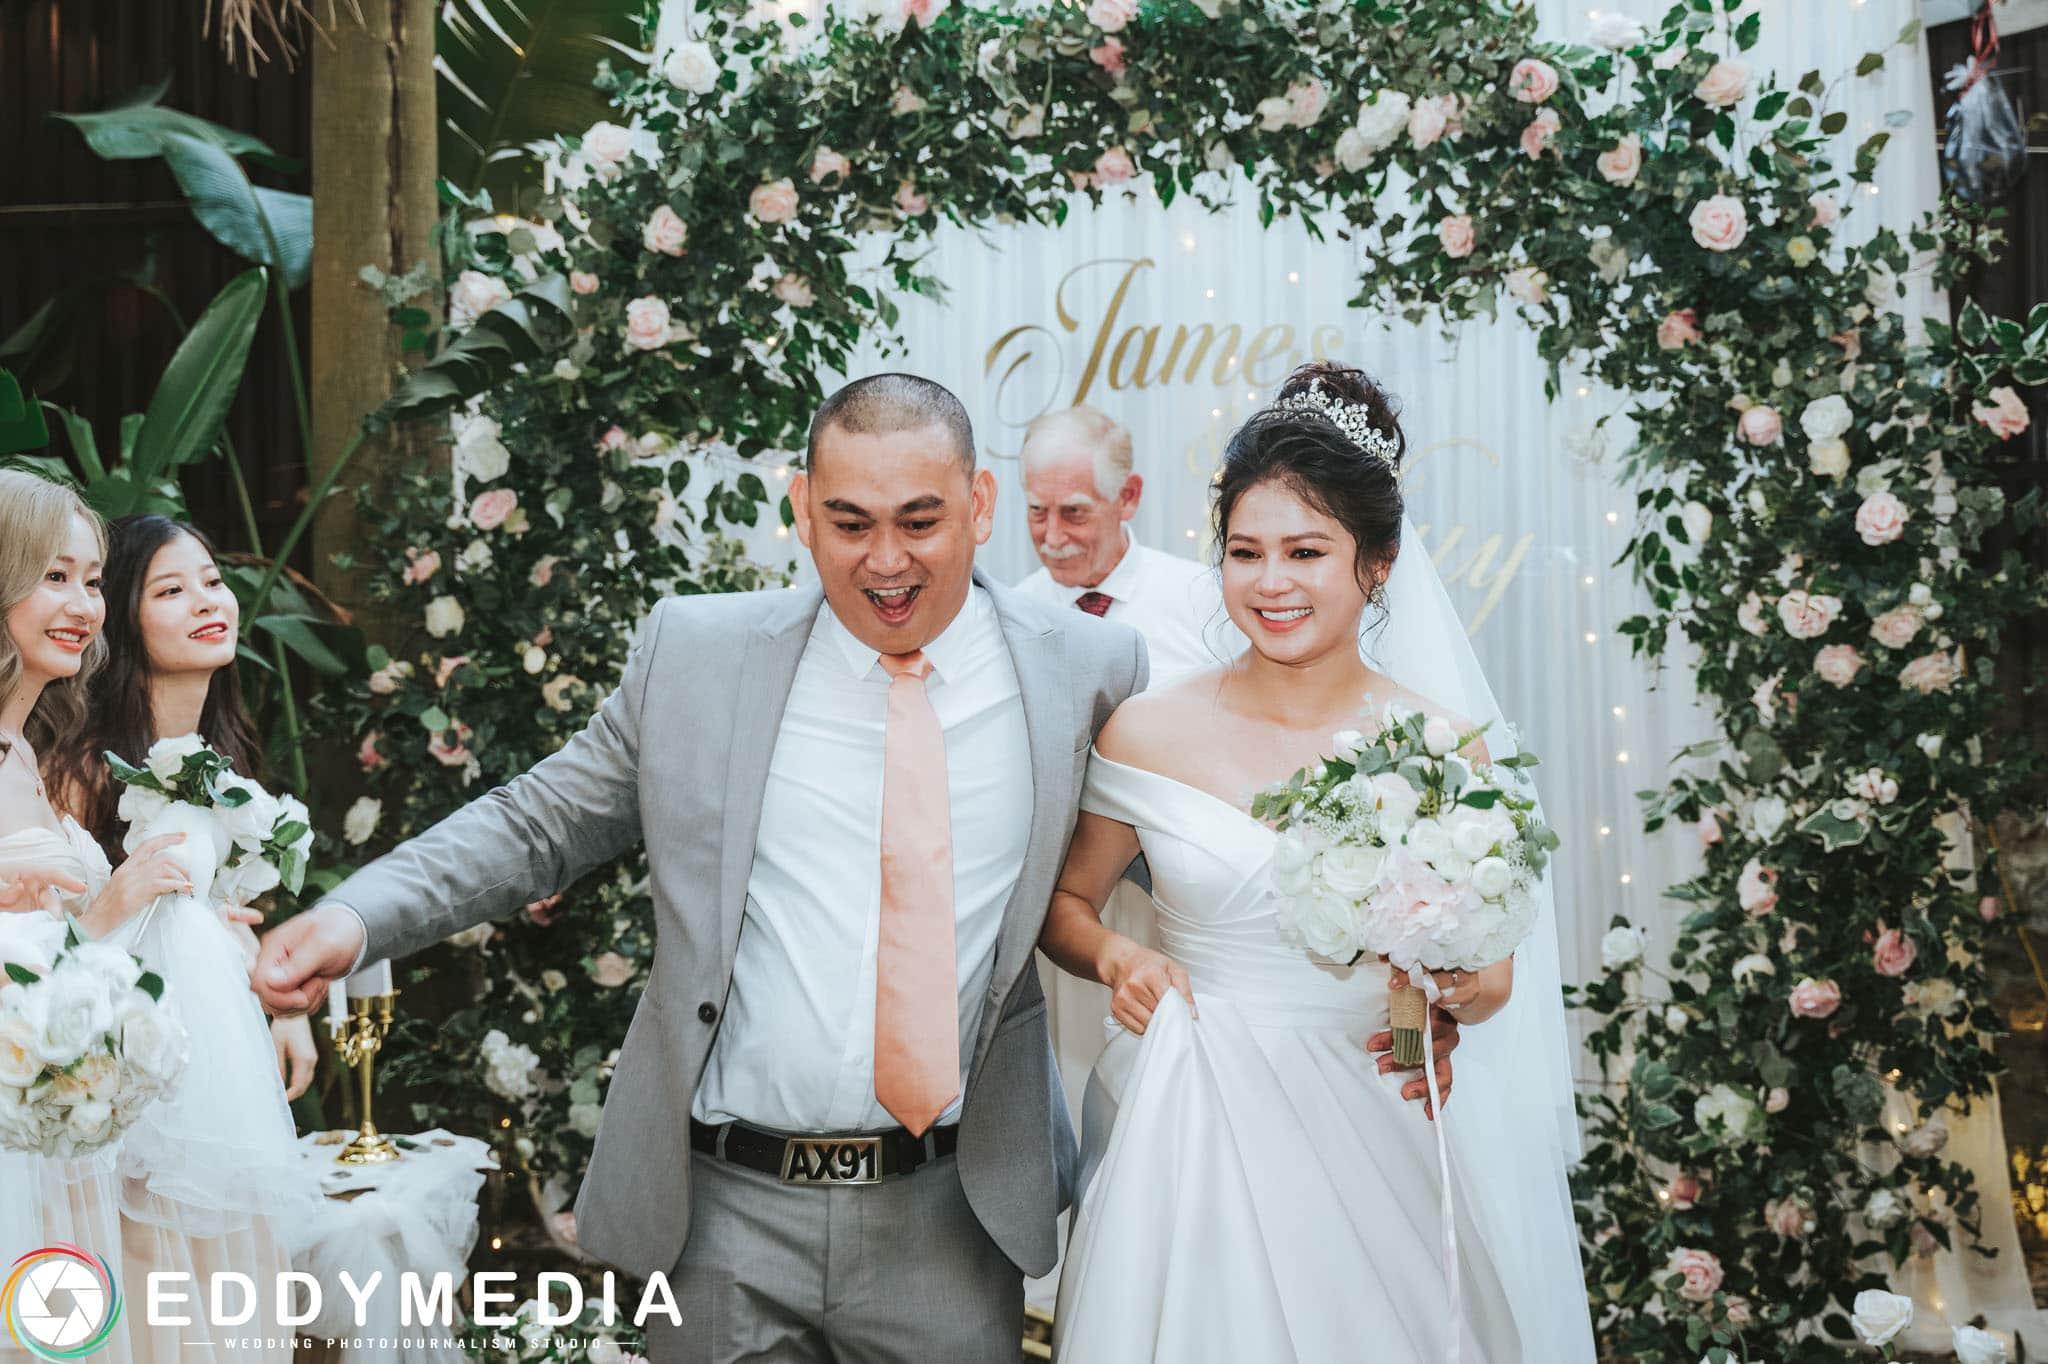 Phongsucuoi James KieuThuy EddyMedia 41 tiệc cưới ngoài trời